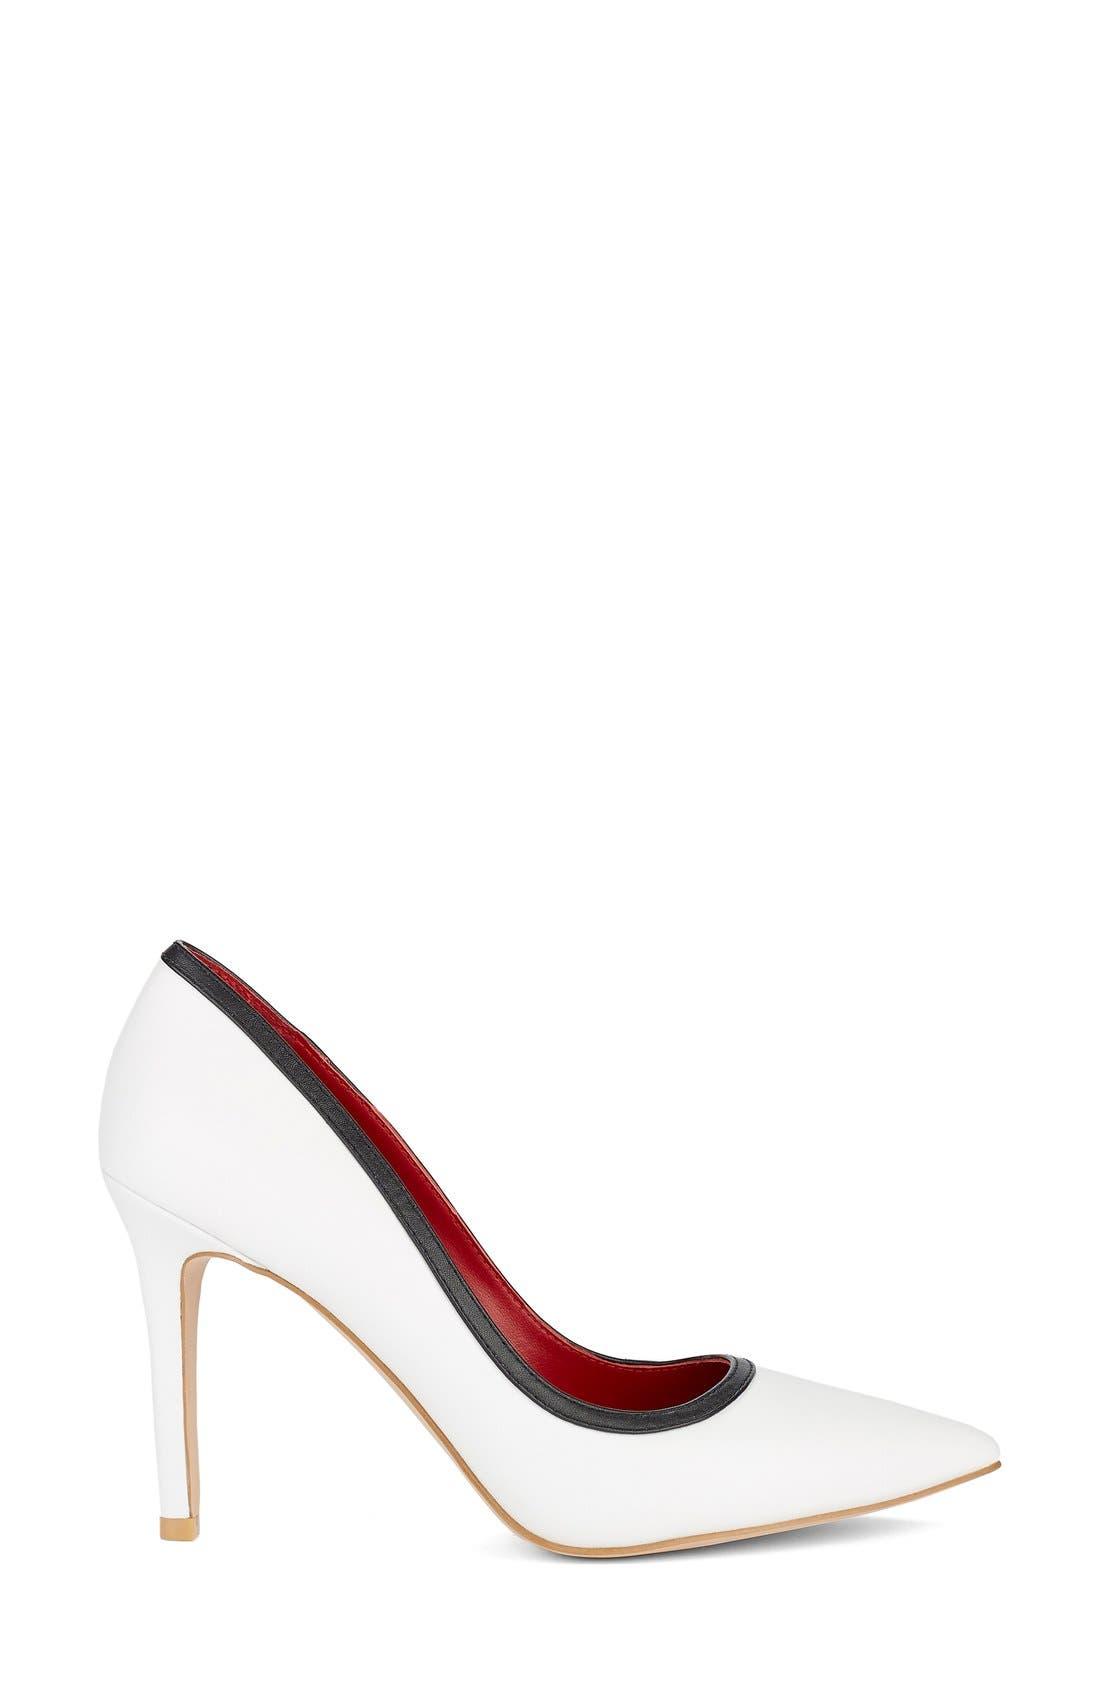 Alternate Image 5  - Shoes of Prey x Kim Jones La Dolce Vita Collection Pointy Toe Pump (Women)